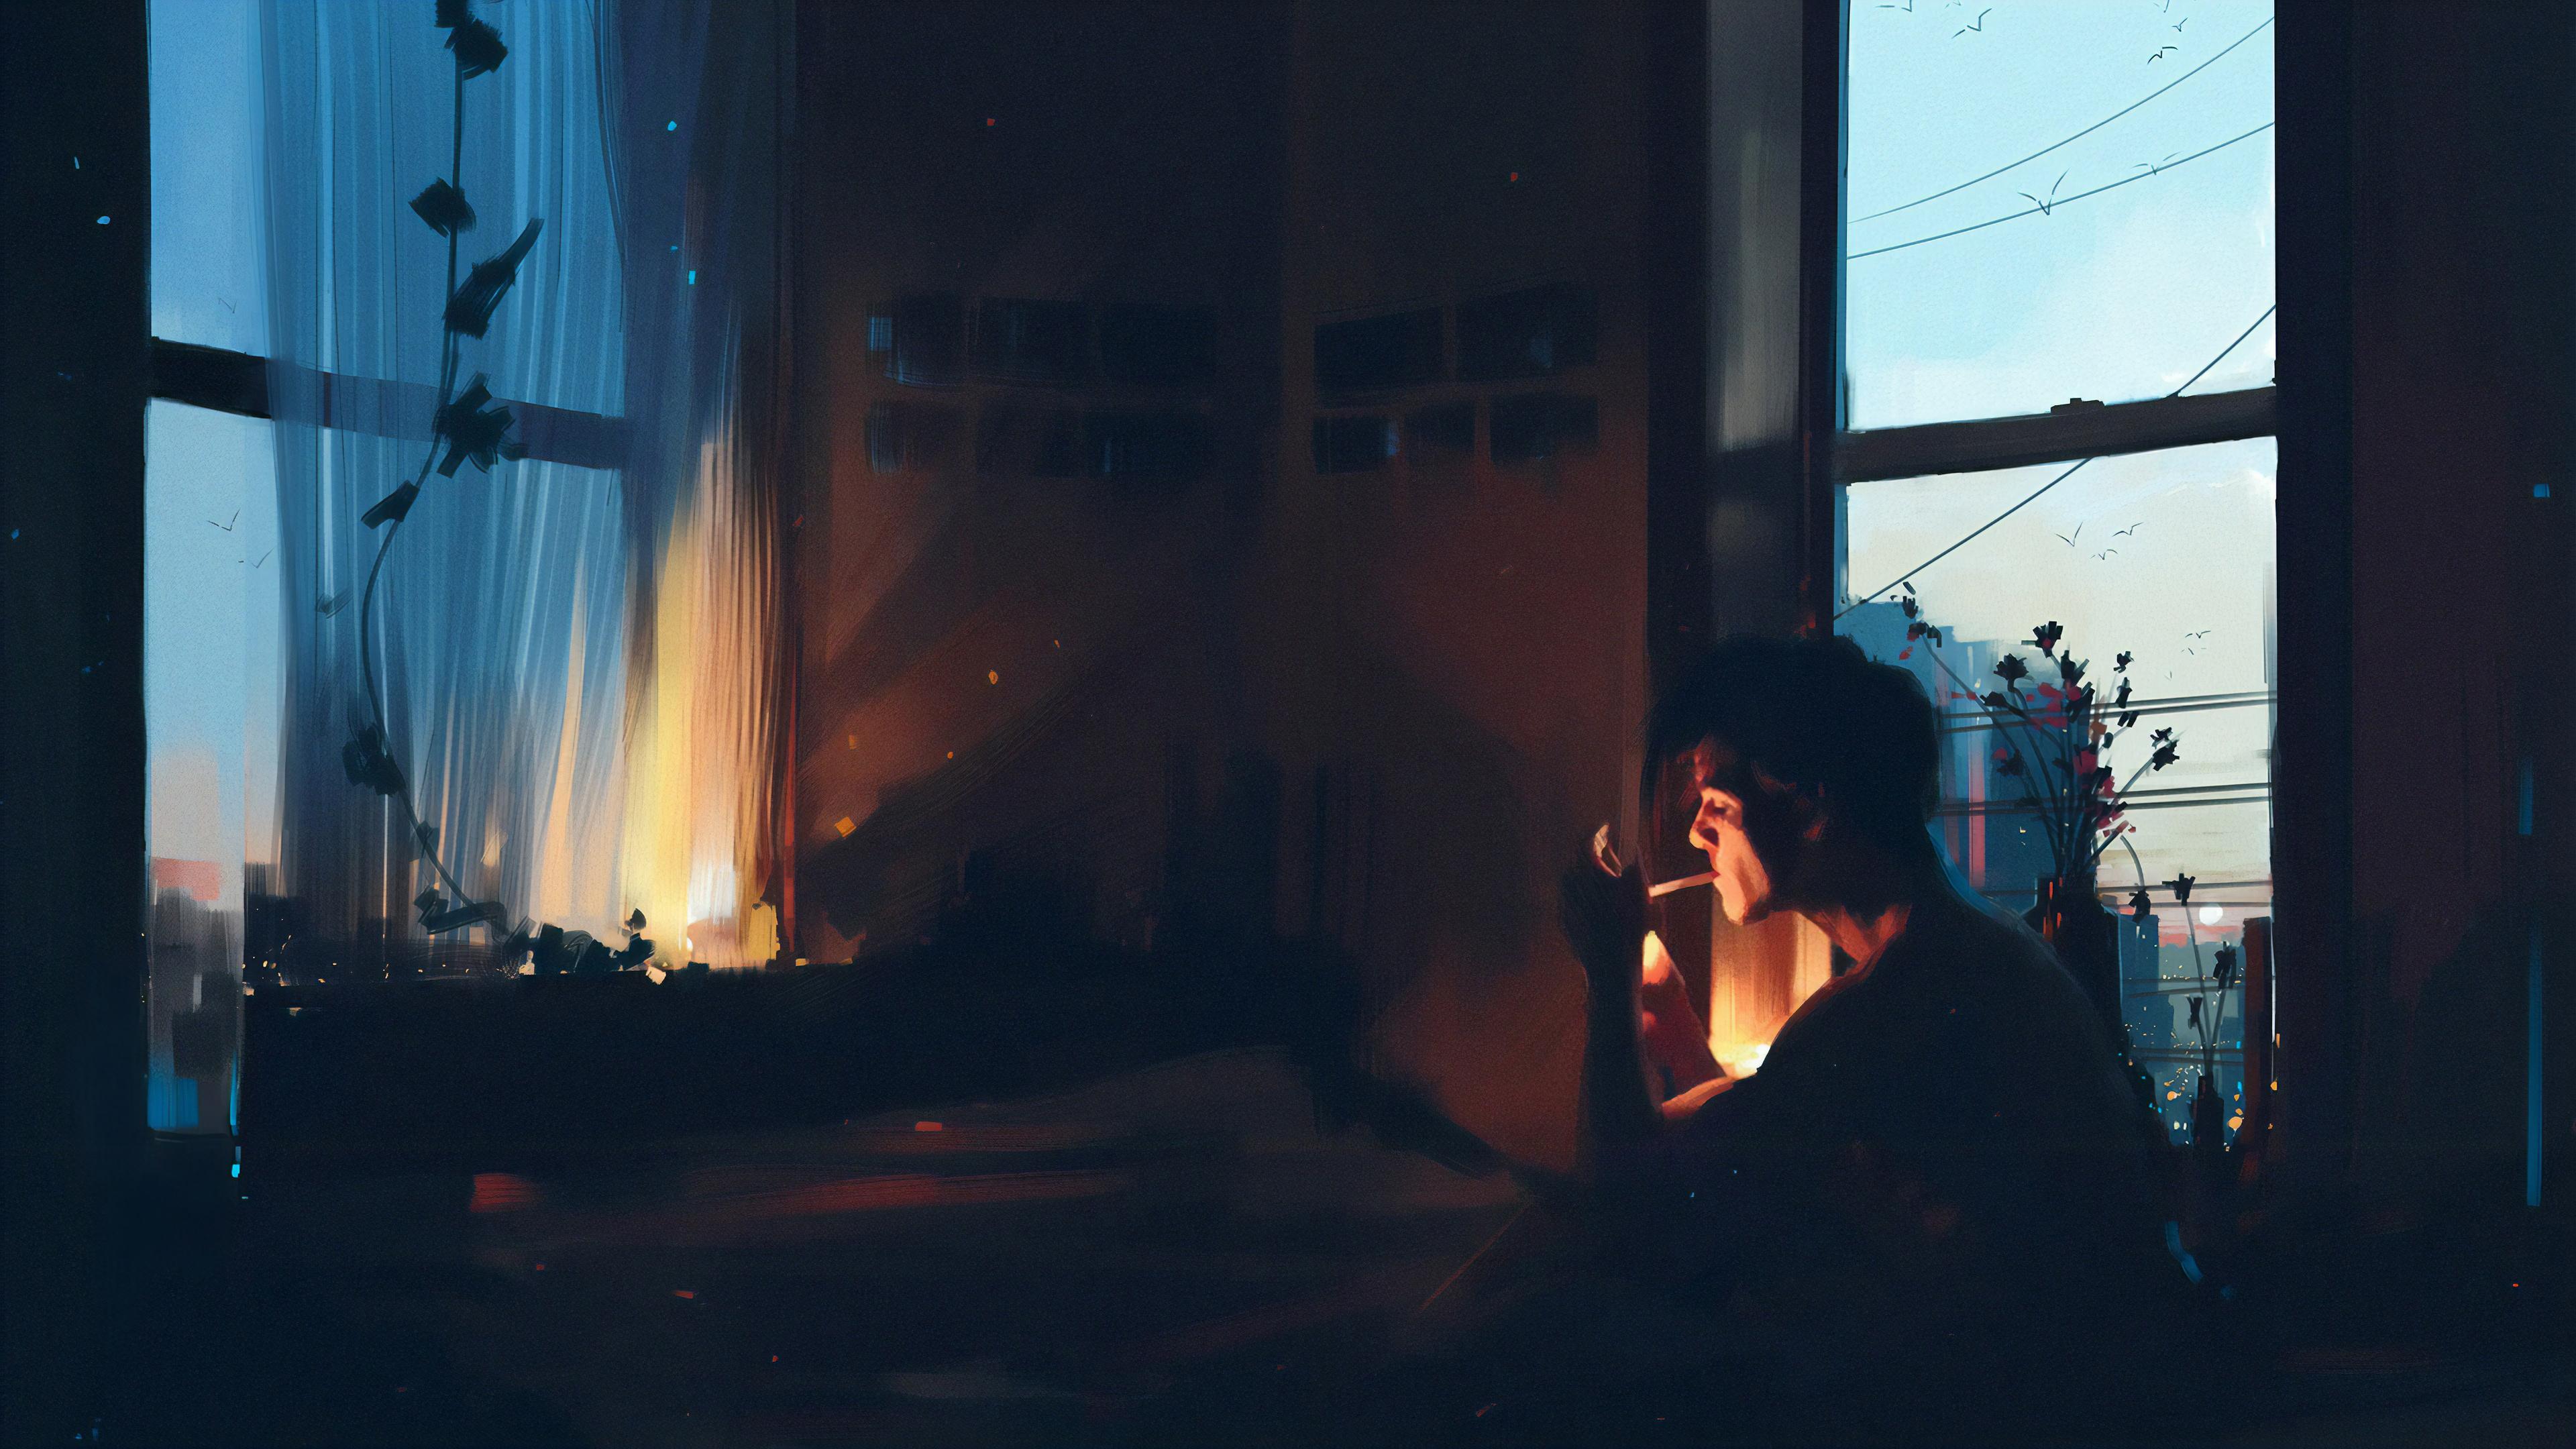 Boy alone in room smoking 4k